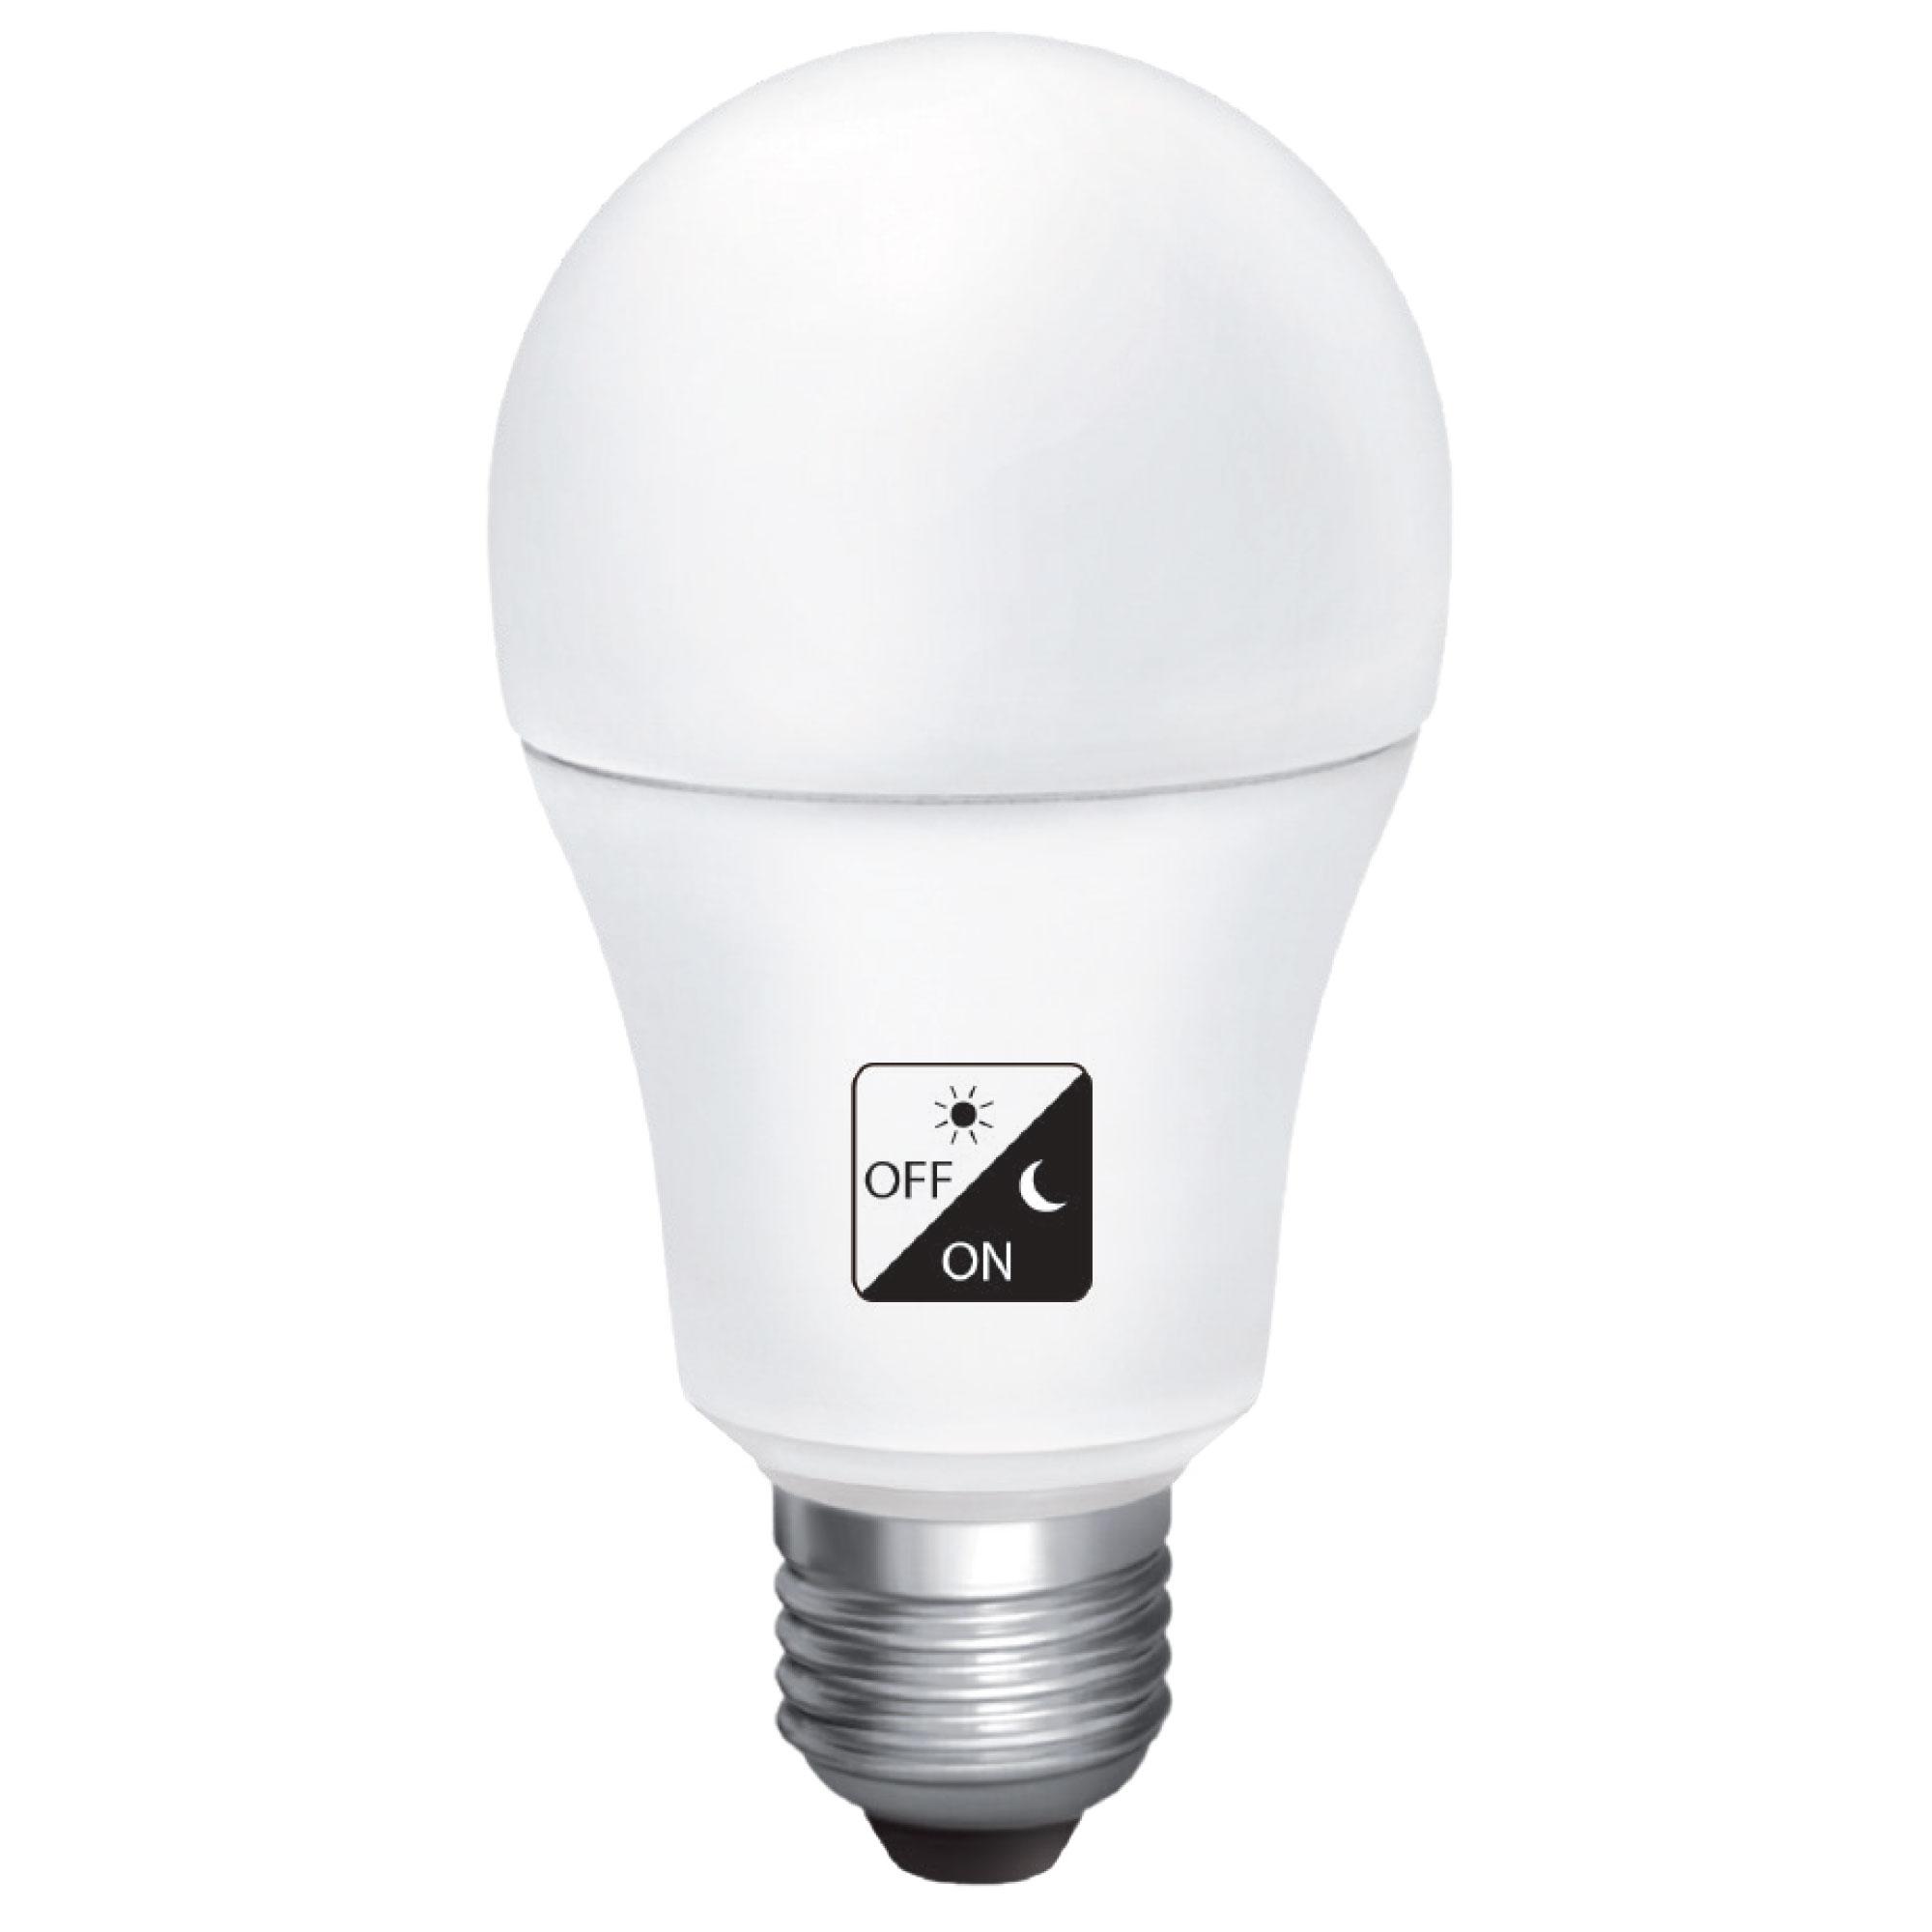 10W LED bulb met schemersensor dag /nacht